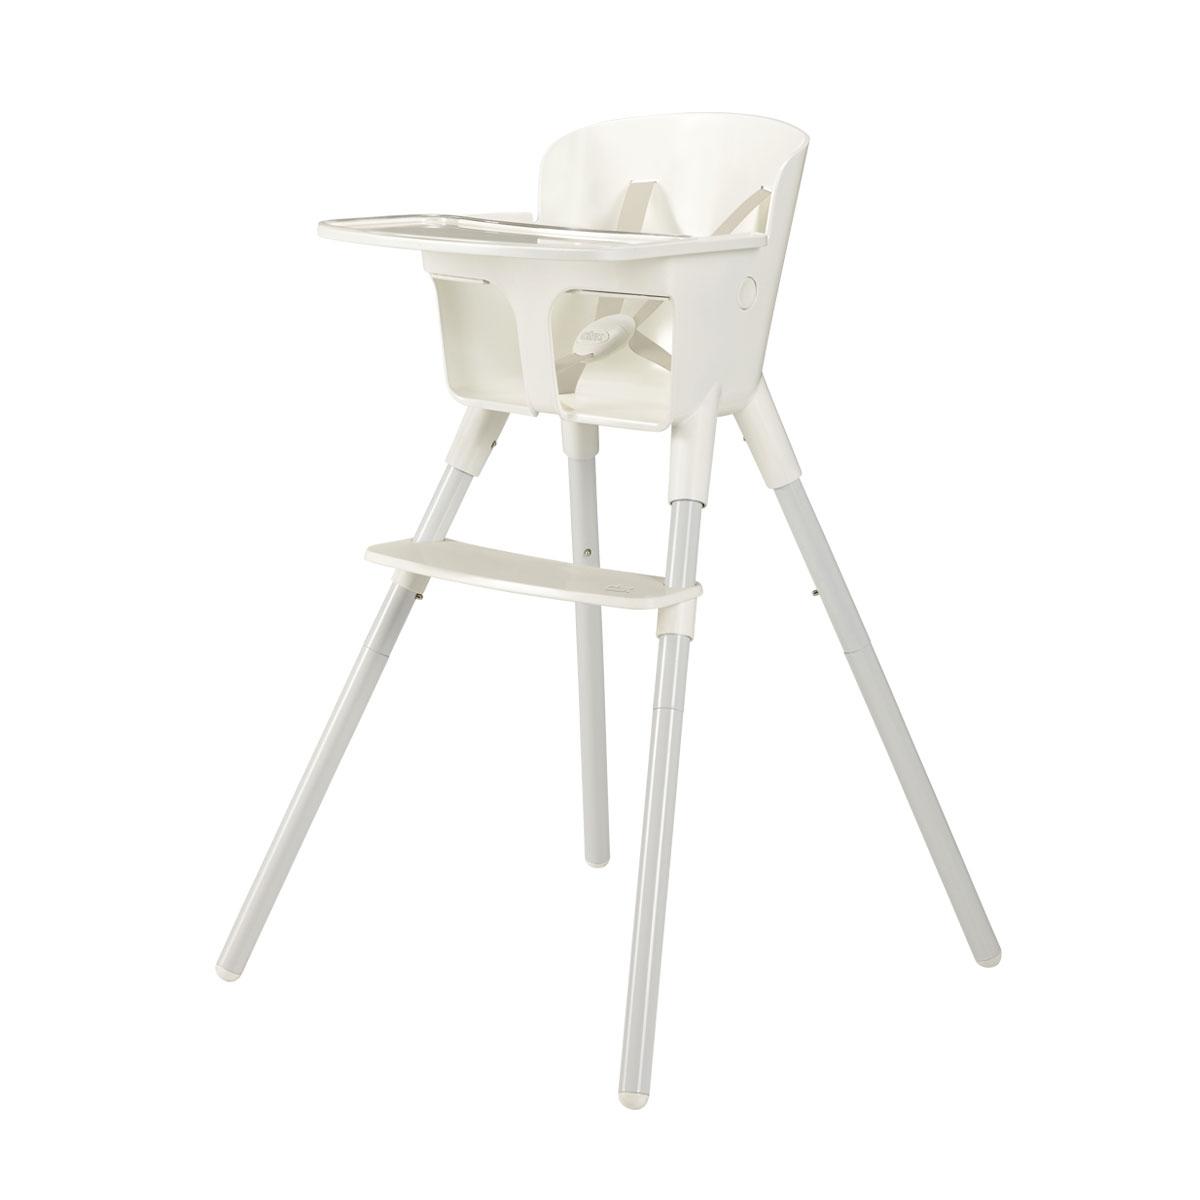 Chaise haute Luyu